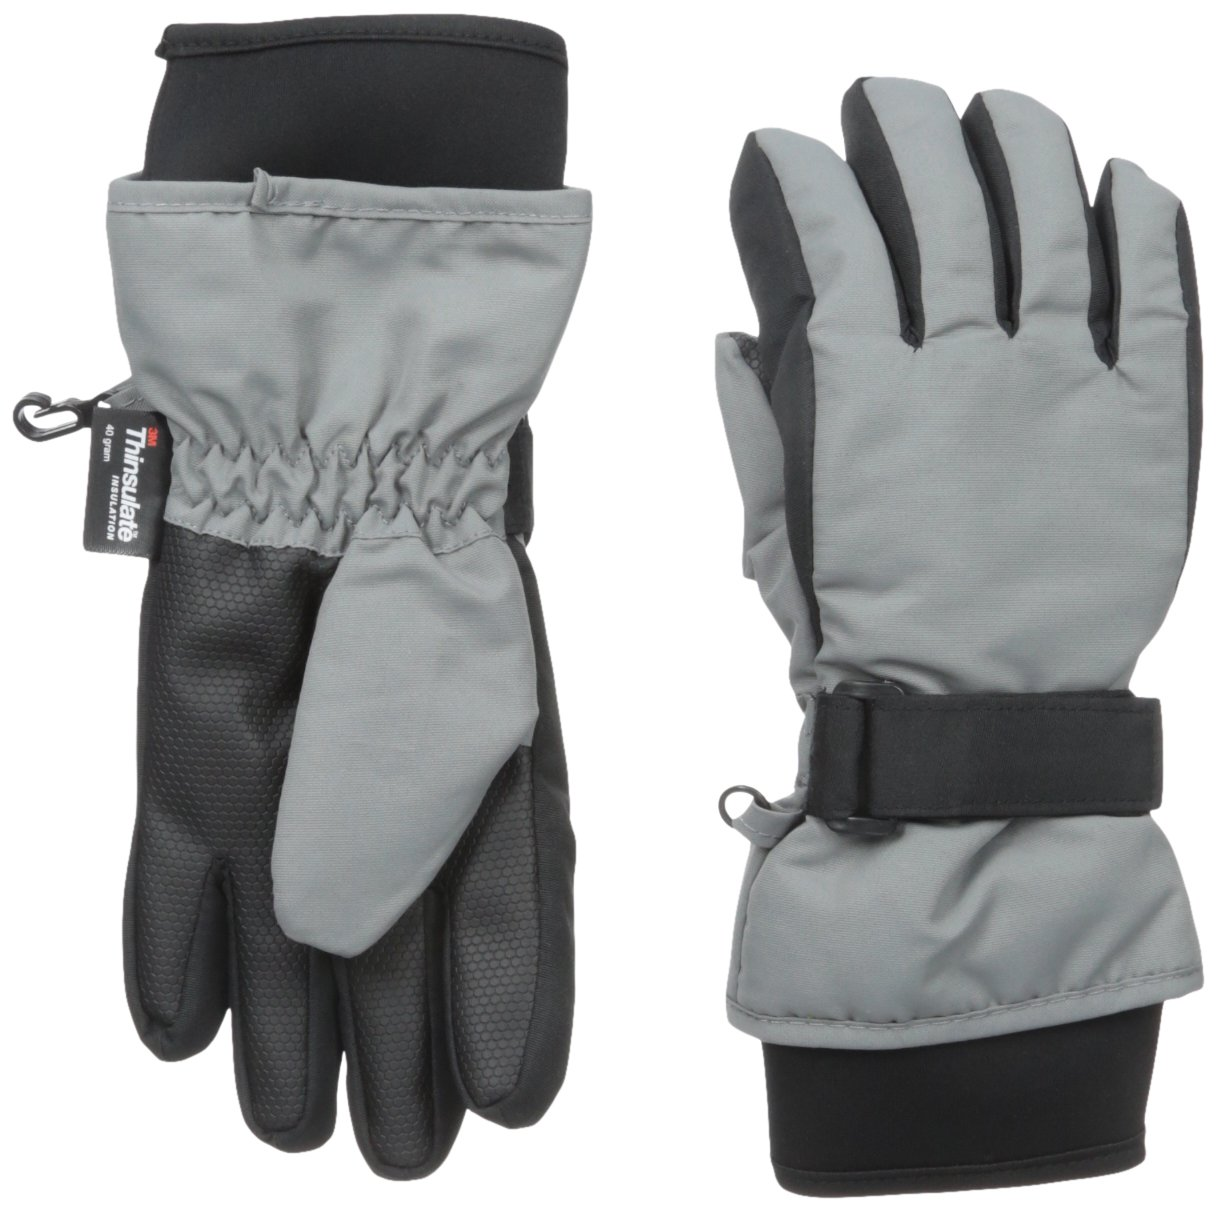 Nolan Gloves Big Boys' Sn'Owen Neoprene Cuff Ski Glove, Grey, Small/Medium